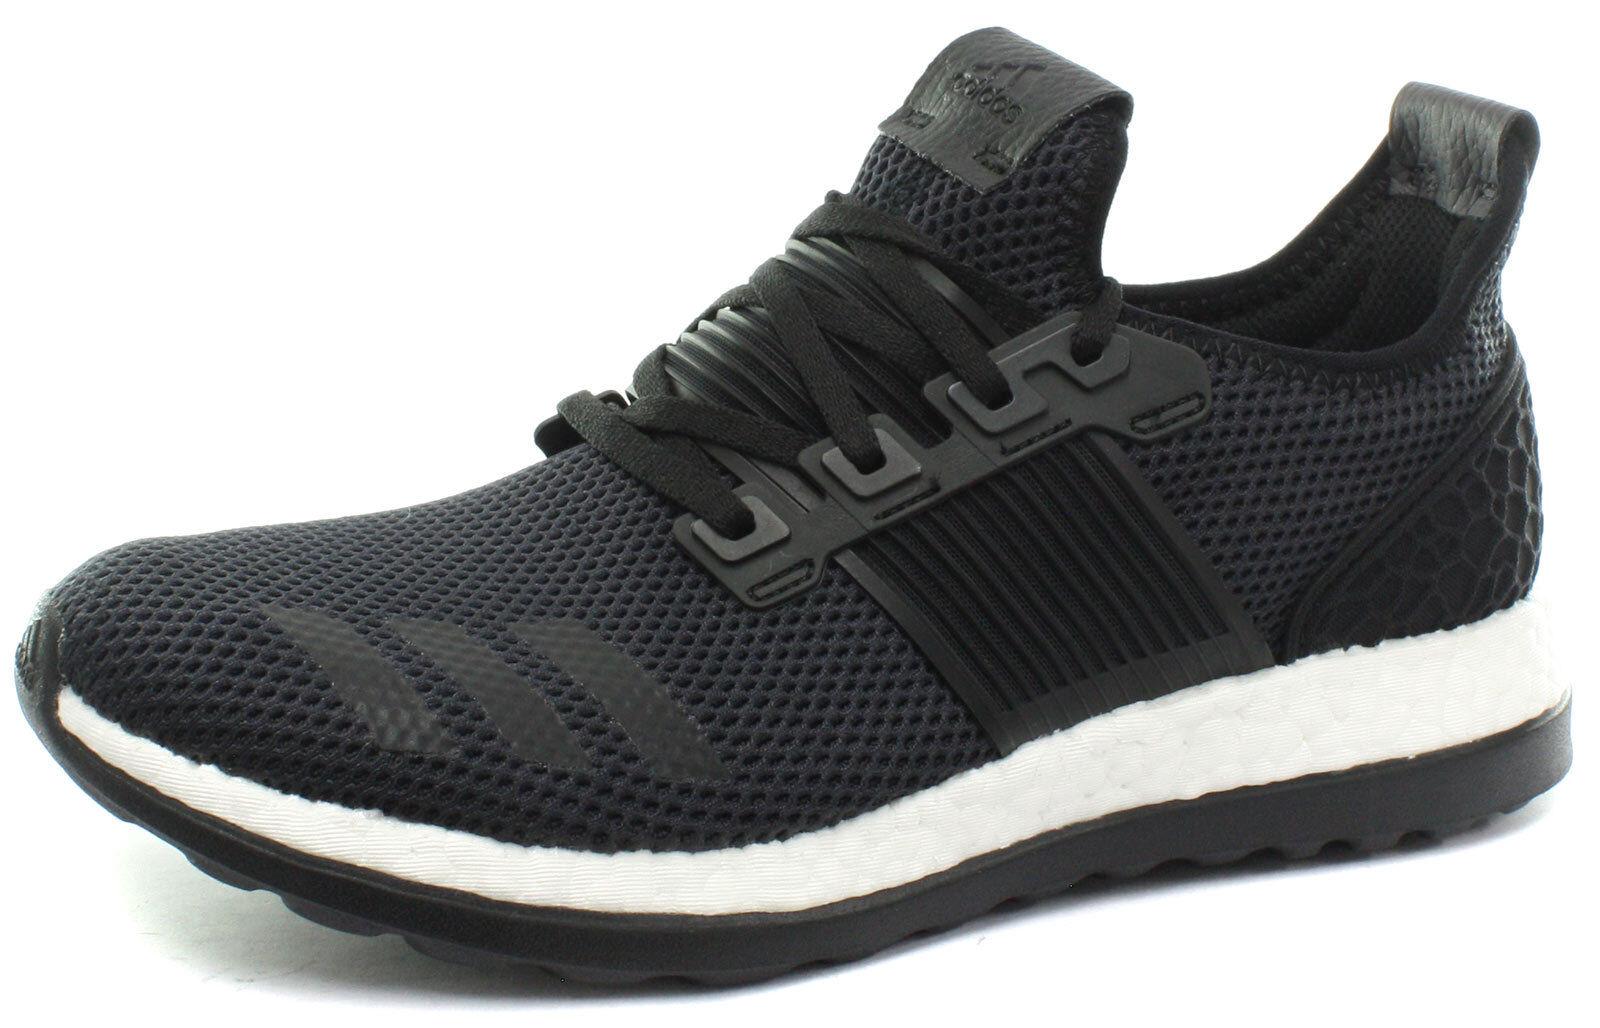 d6885f7f48023 Adidas Performance Men s ZG Running shoes US 5.5 Pureboost BA8613 ...